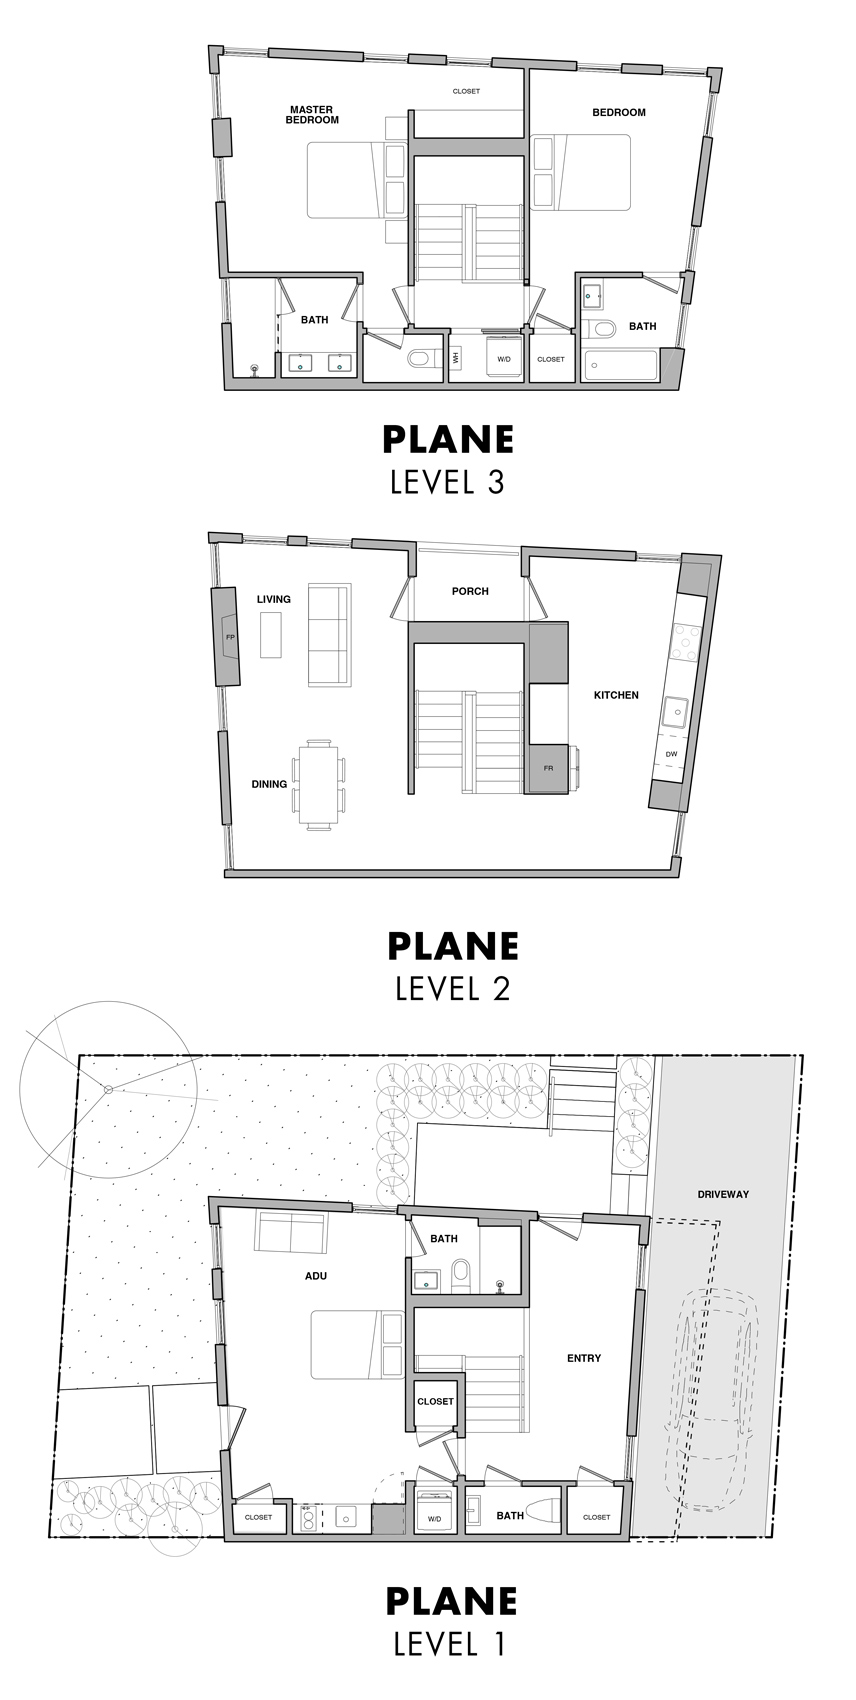 PLANE_FLOORPLAN.jpg